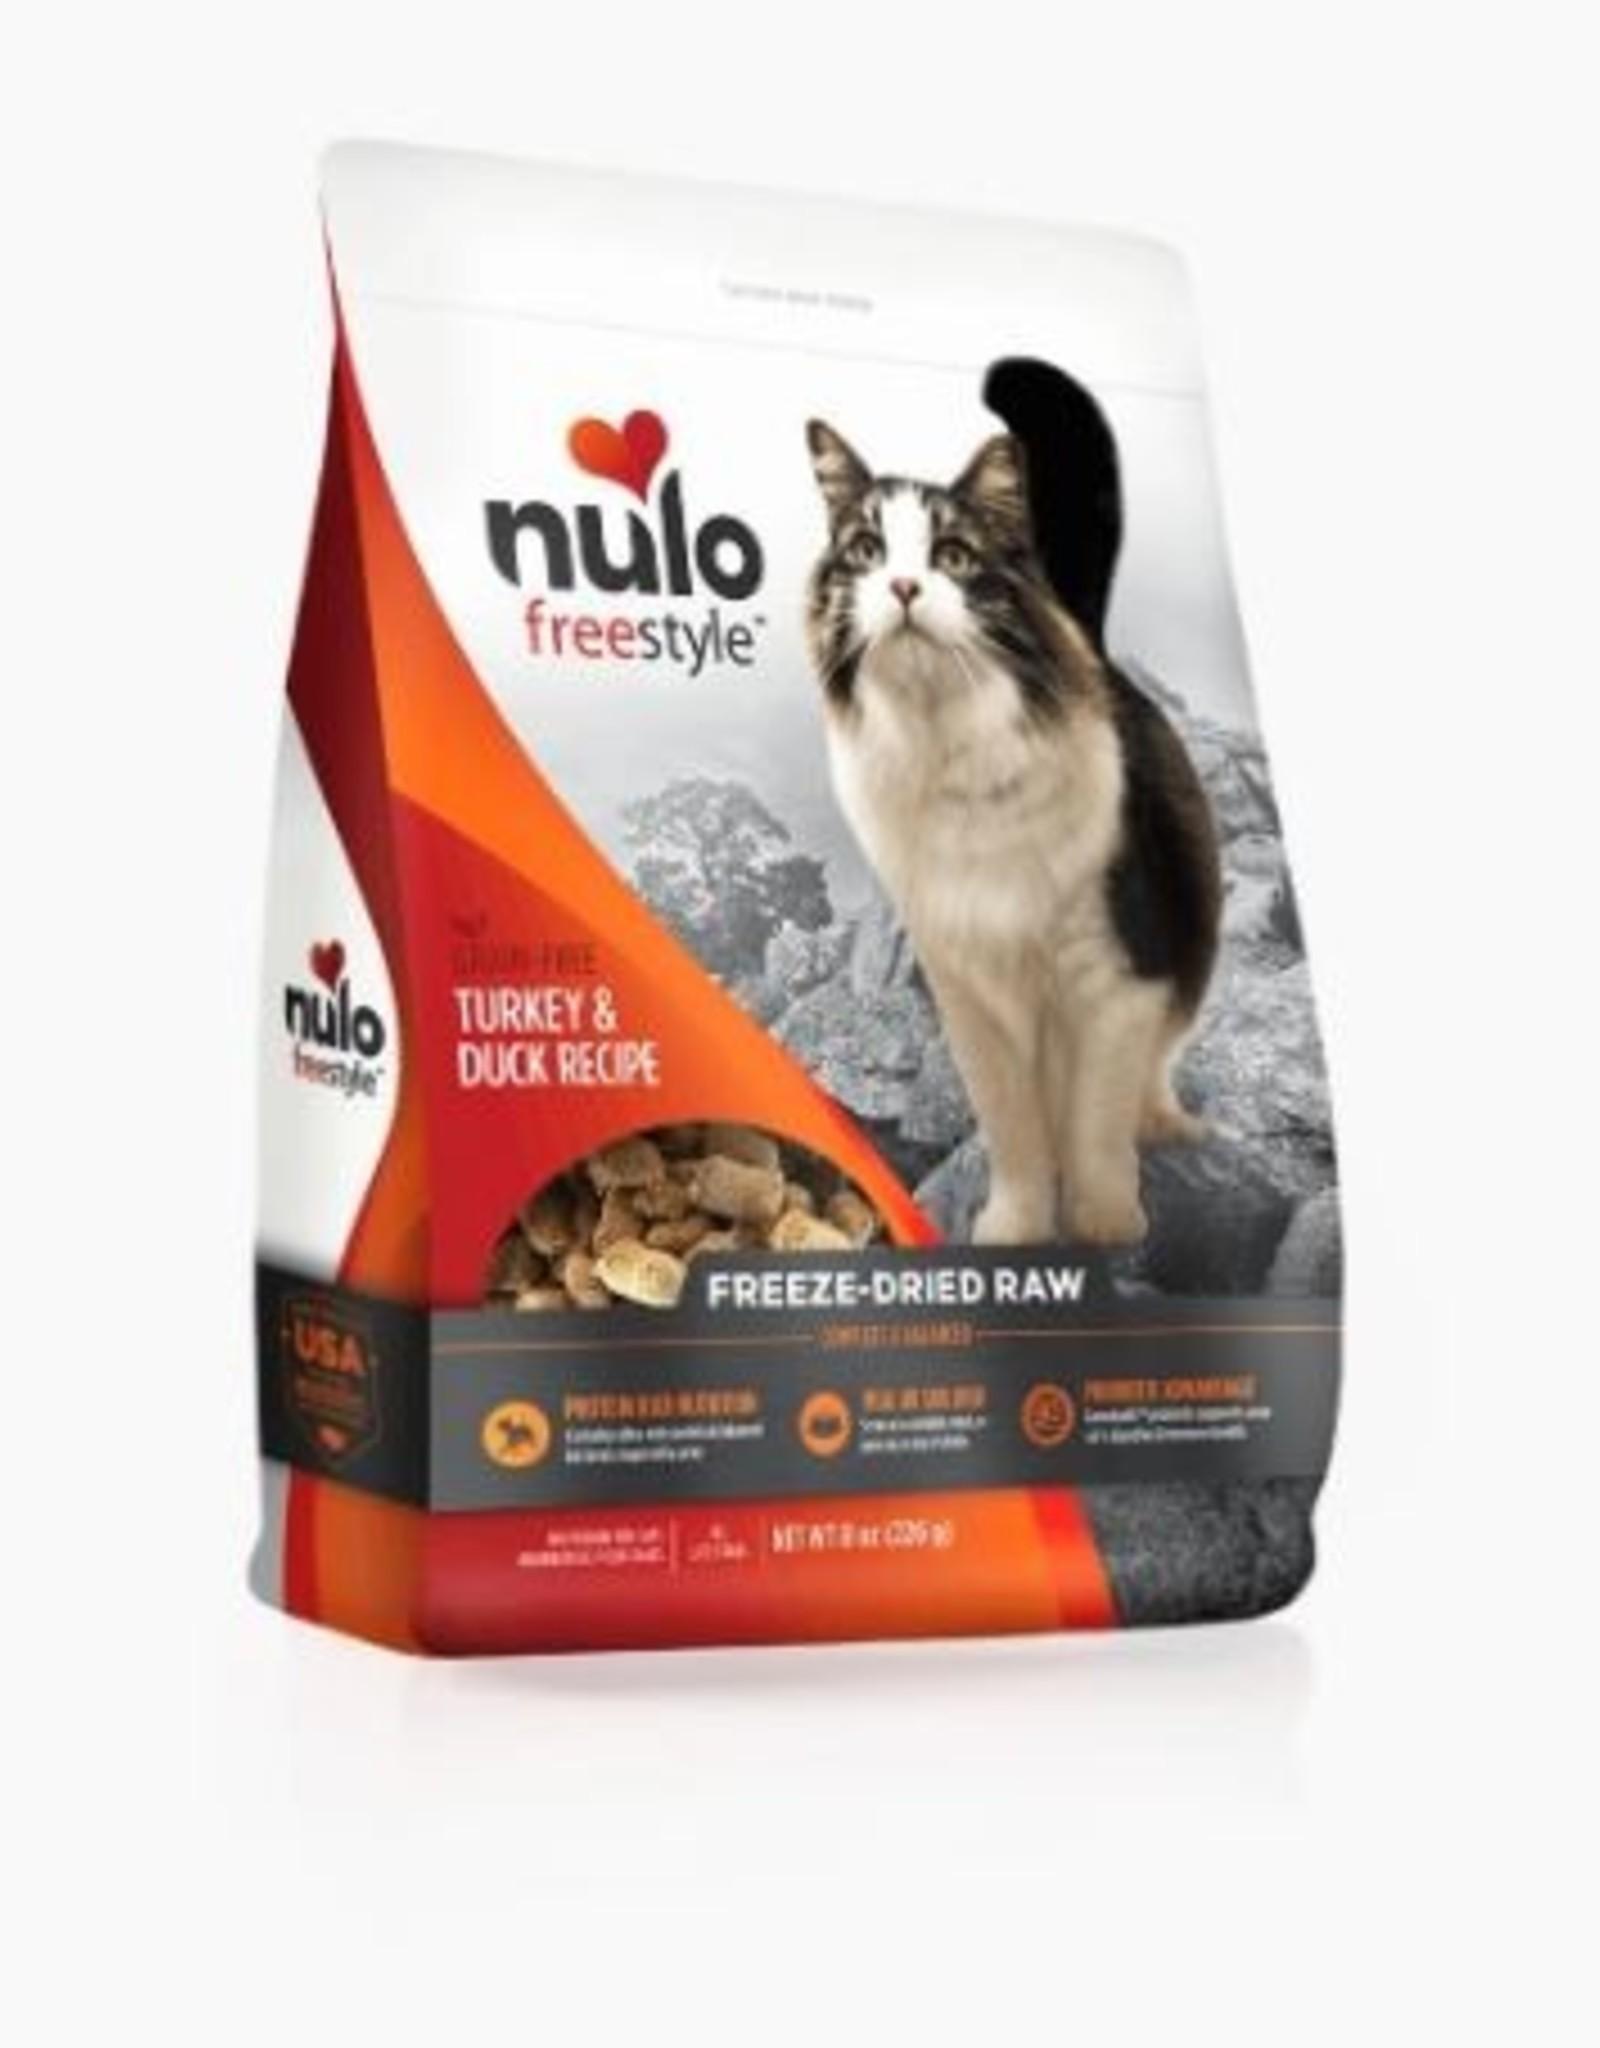 Nulo Freeze Dried Raw Grain Free Turkey & Duck CAT Food 8 oz